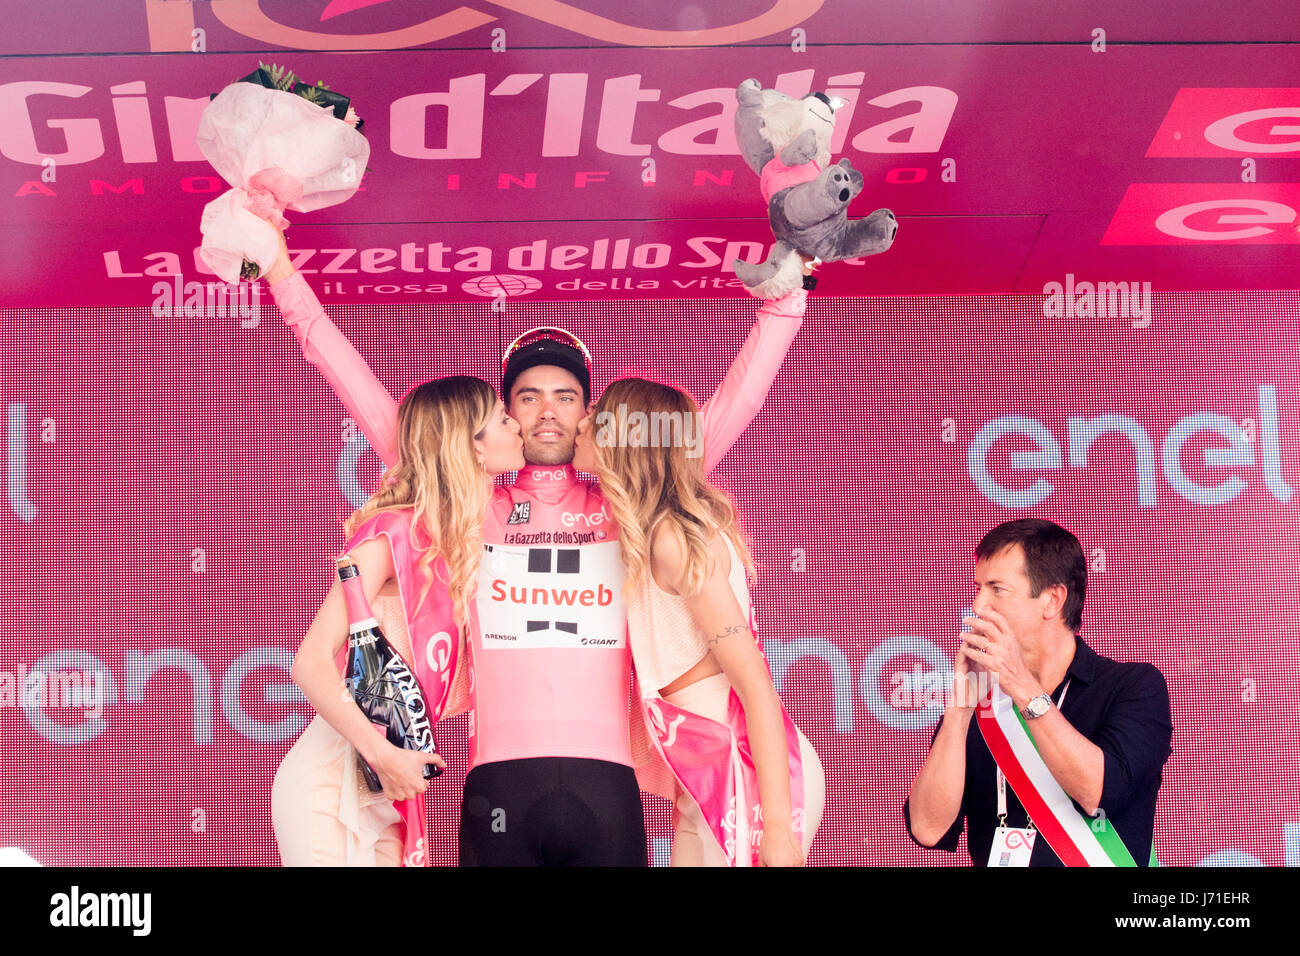 Bergamo, 21th may 2017, Italy Giro D'Italia stage 14 - Stock Image